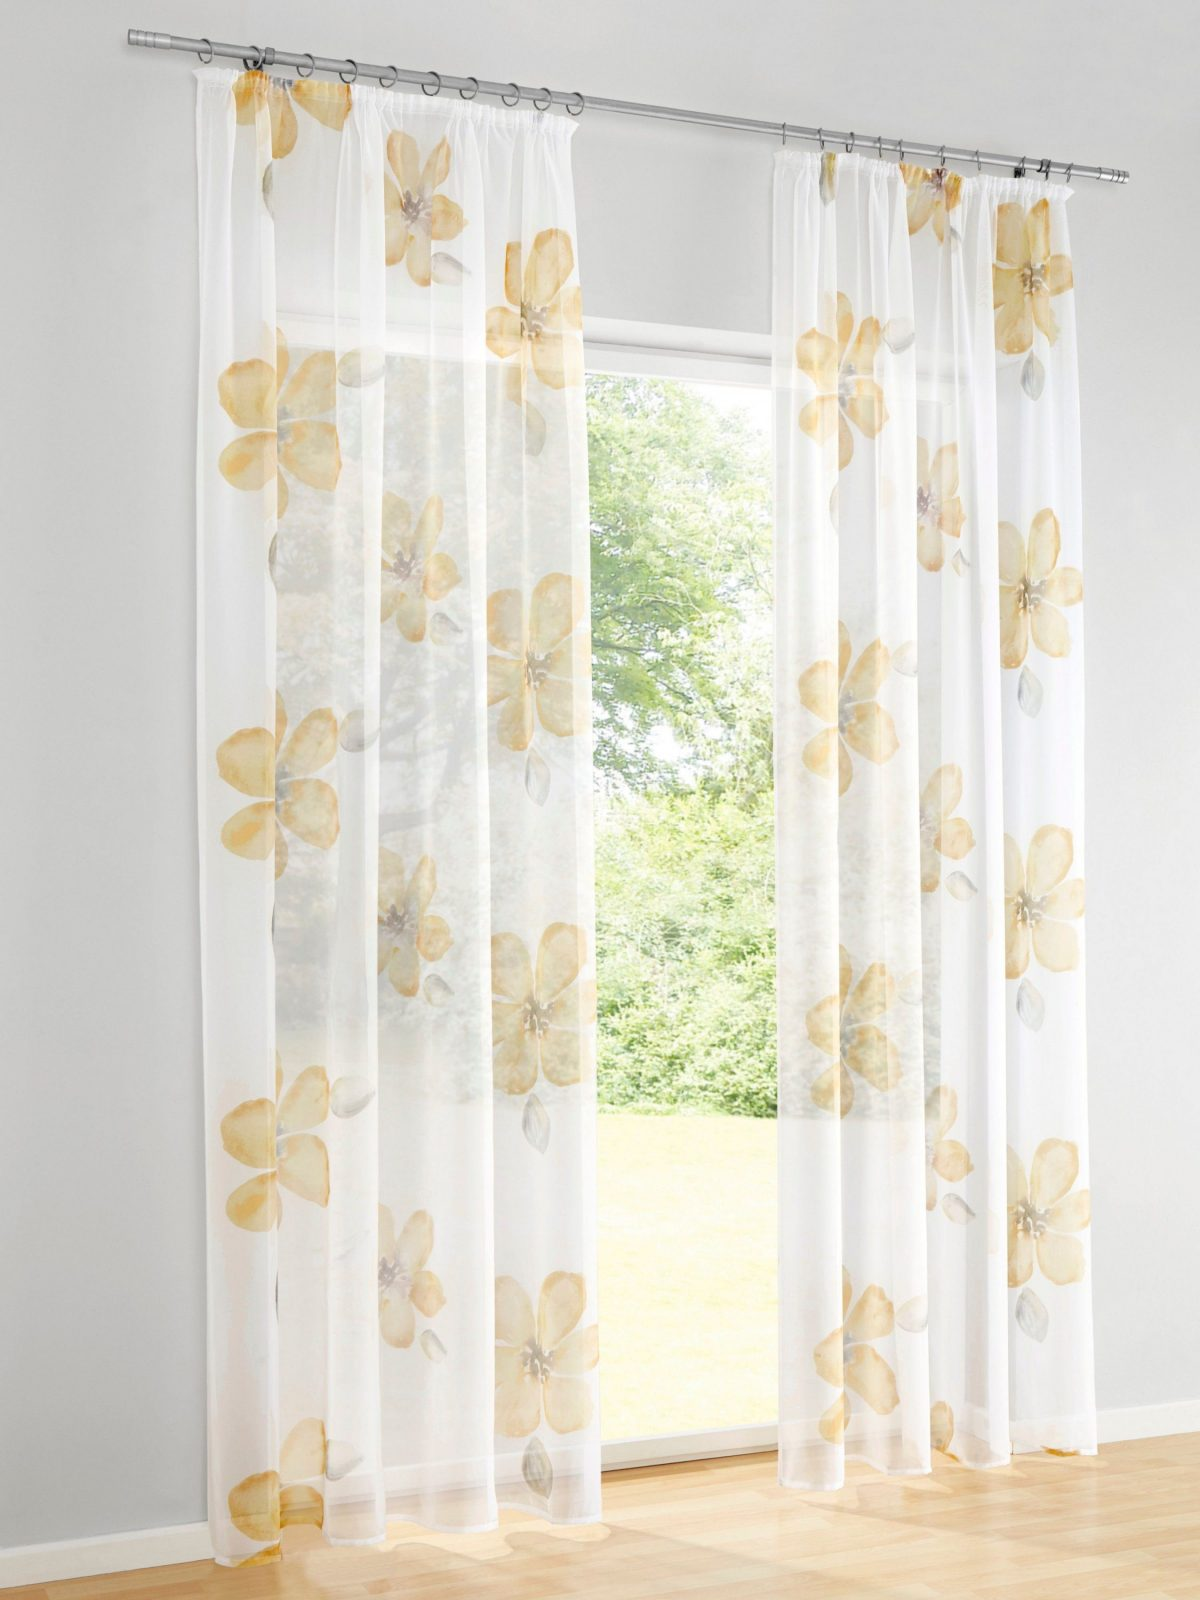 bonprix katalog gardinen haus design ideen. Black Bedroom Furniture Sets. Home Design Ideas